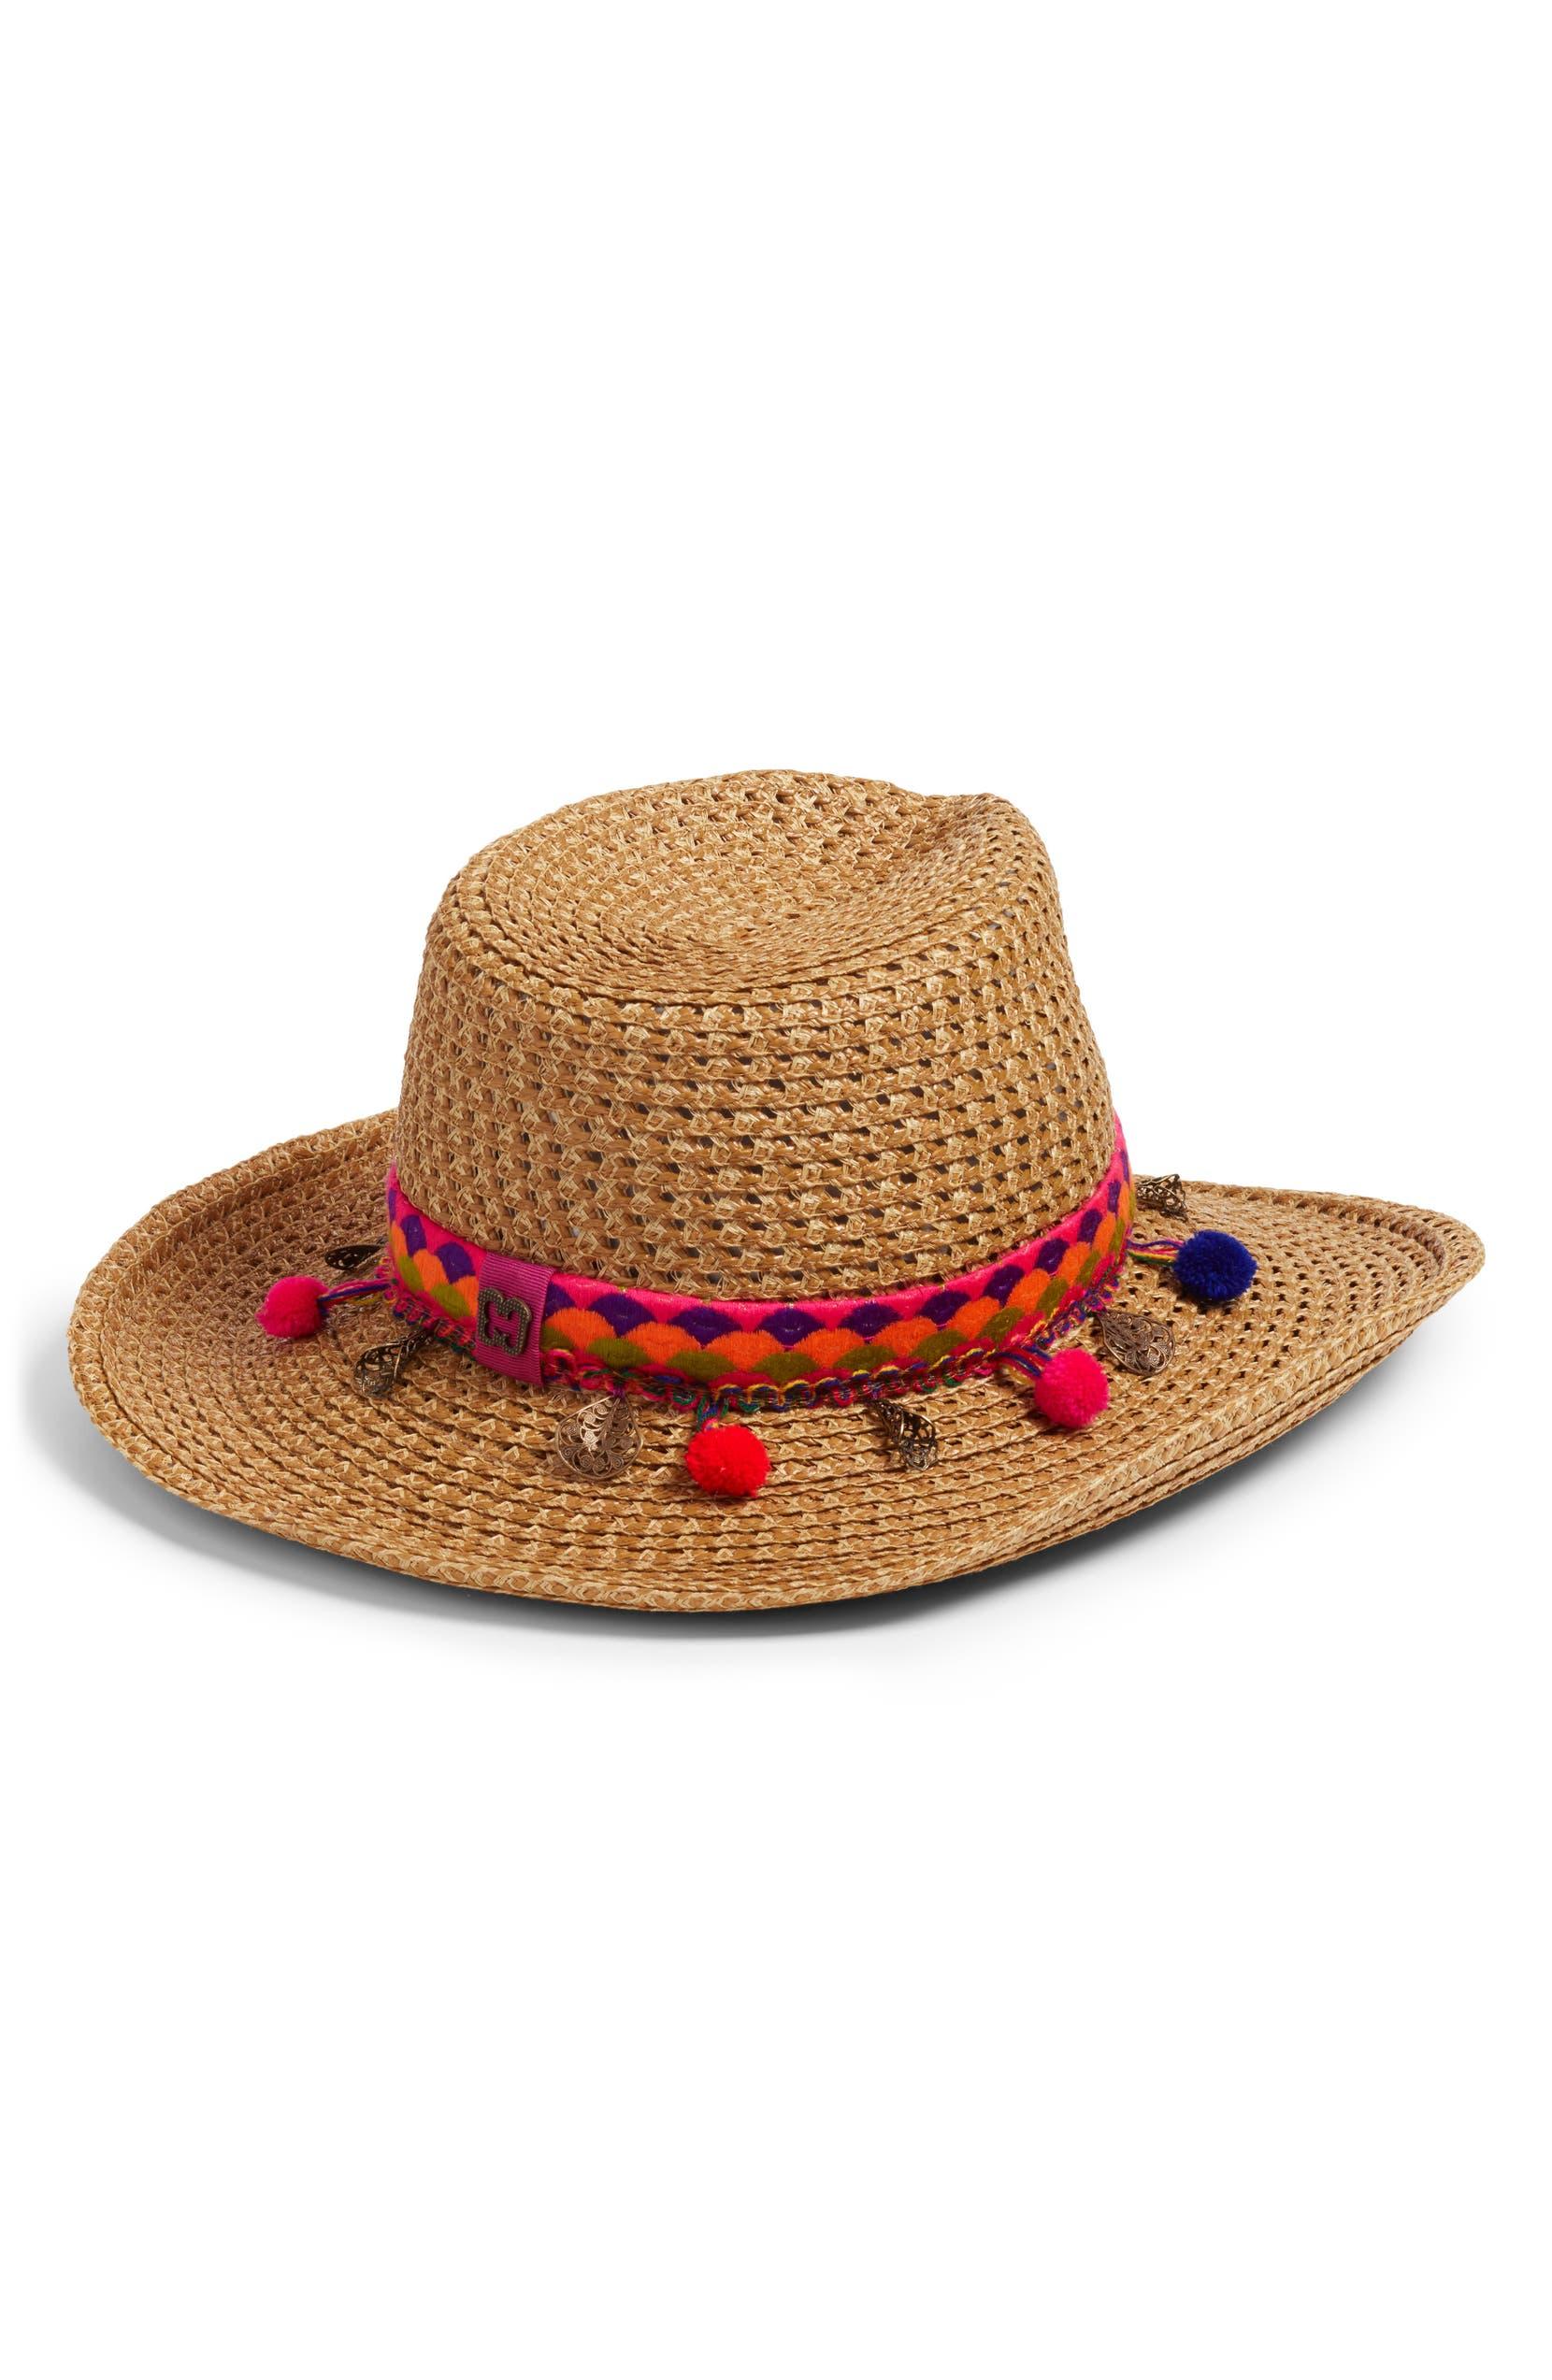 3f8e09e079d Eric Javits Sunny Squishee® Western Hat